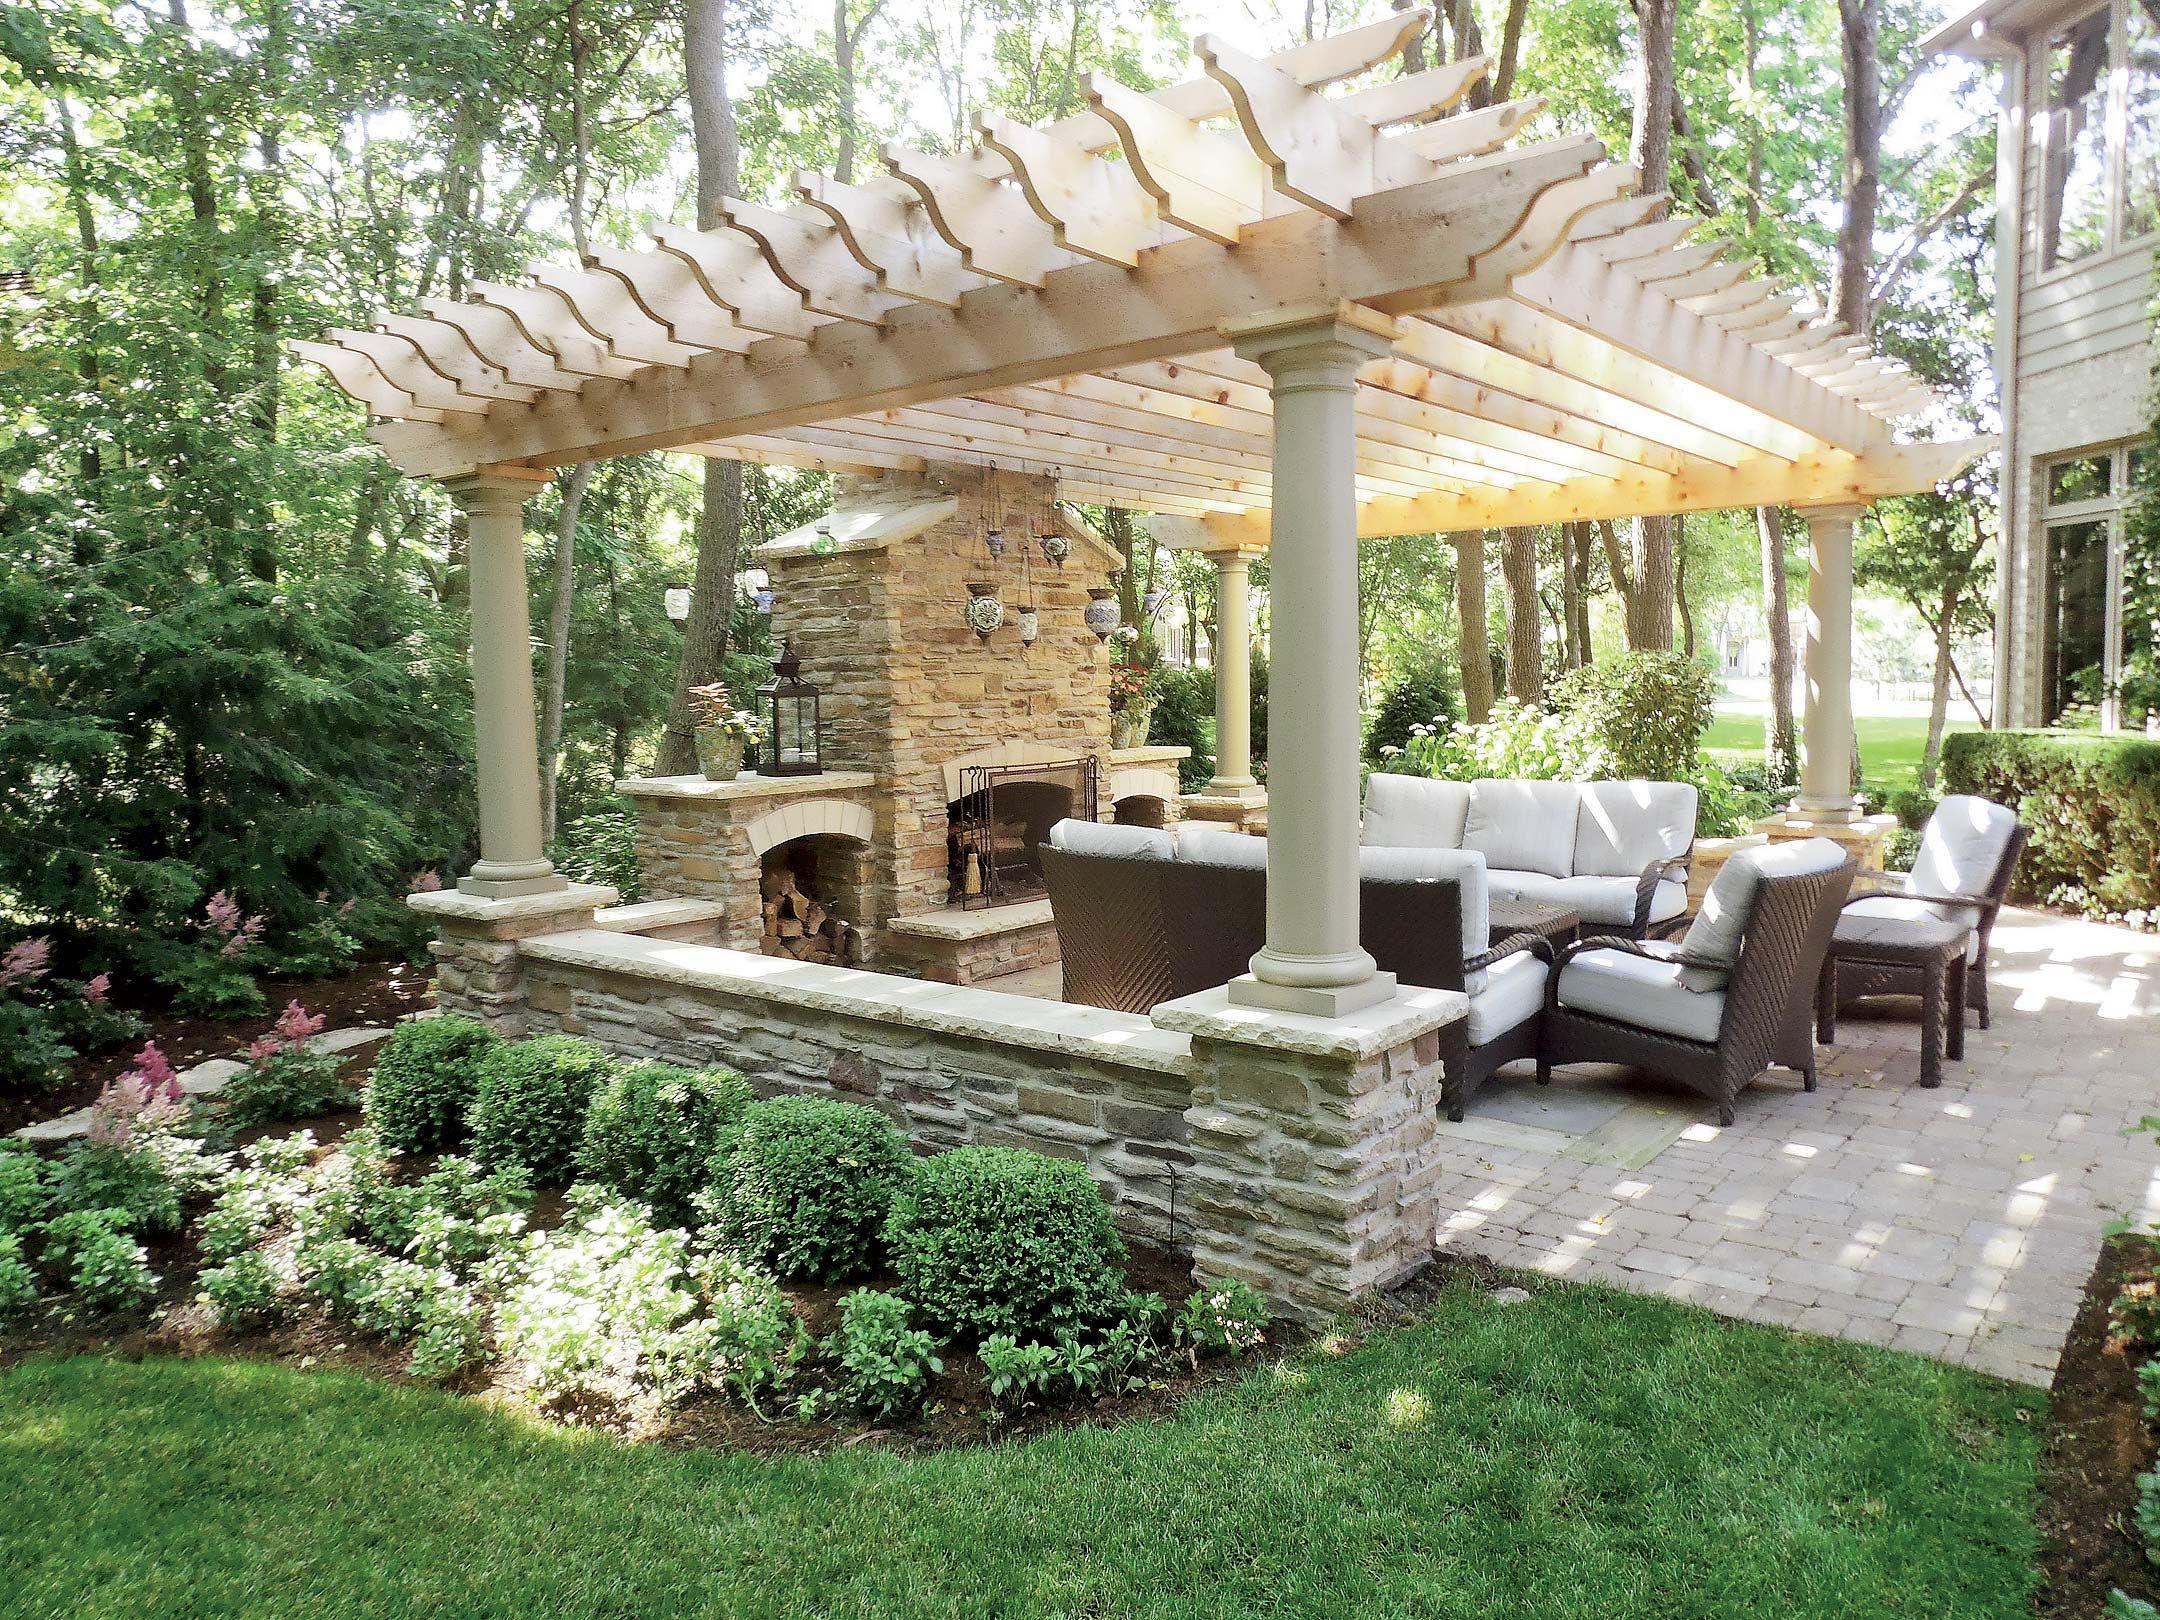 20 Creative Patio Outdoor Bar Ideas You Must Try At Your Backyard Backyard Backyard Patio Backyard Pergola